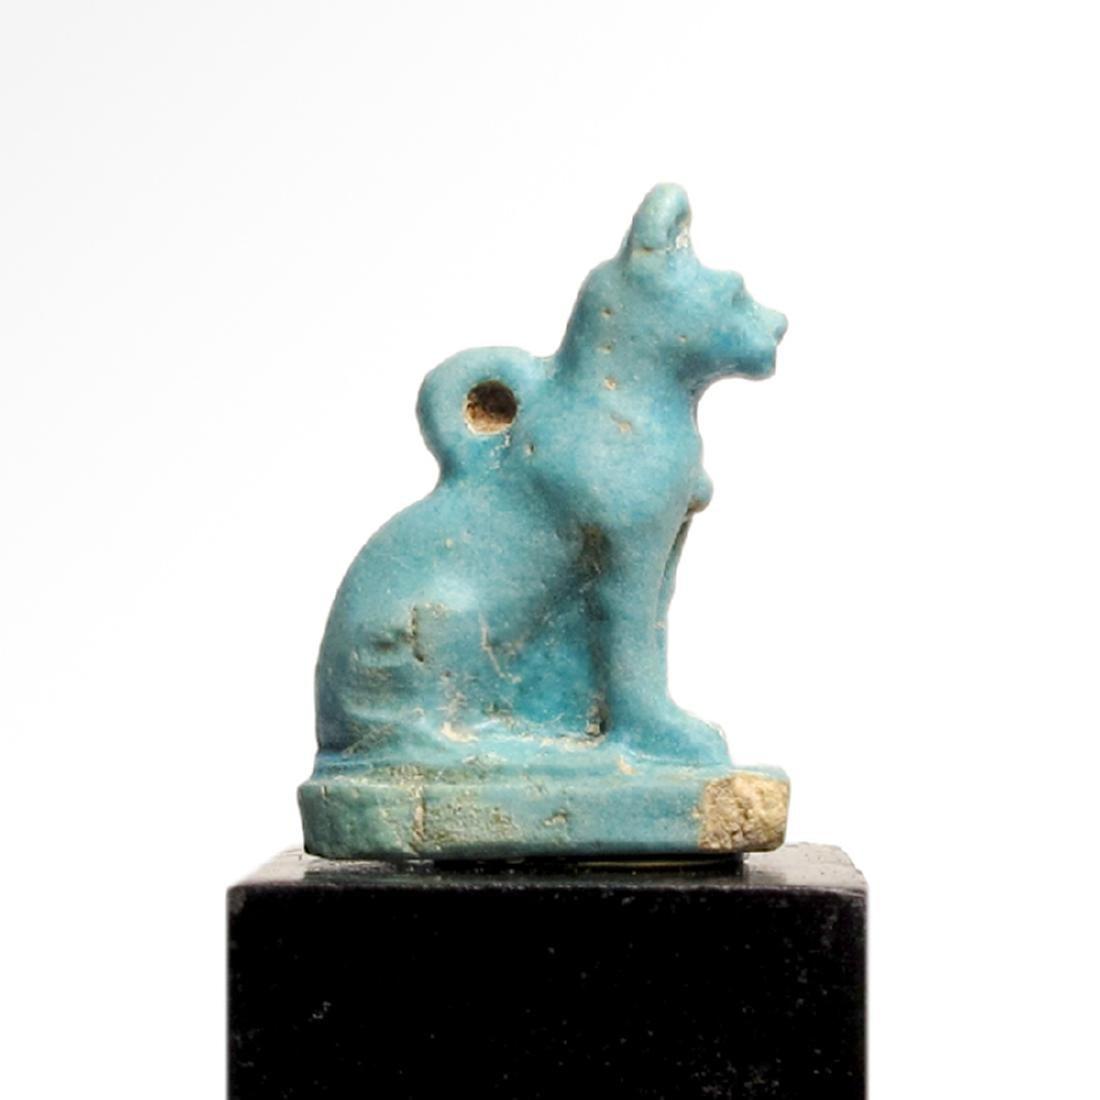 Egyptian Faience Cat Amulet, c. 900 B.C. - 2